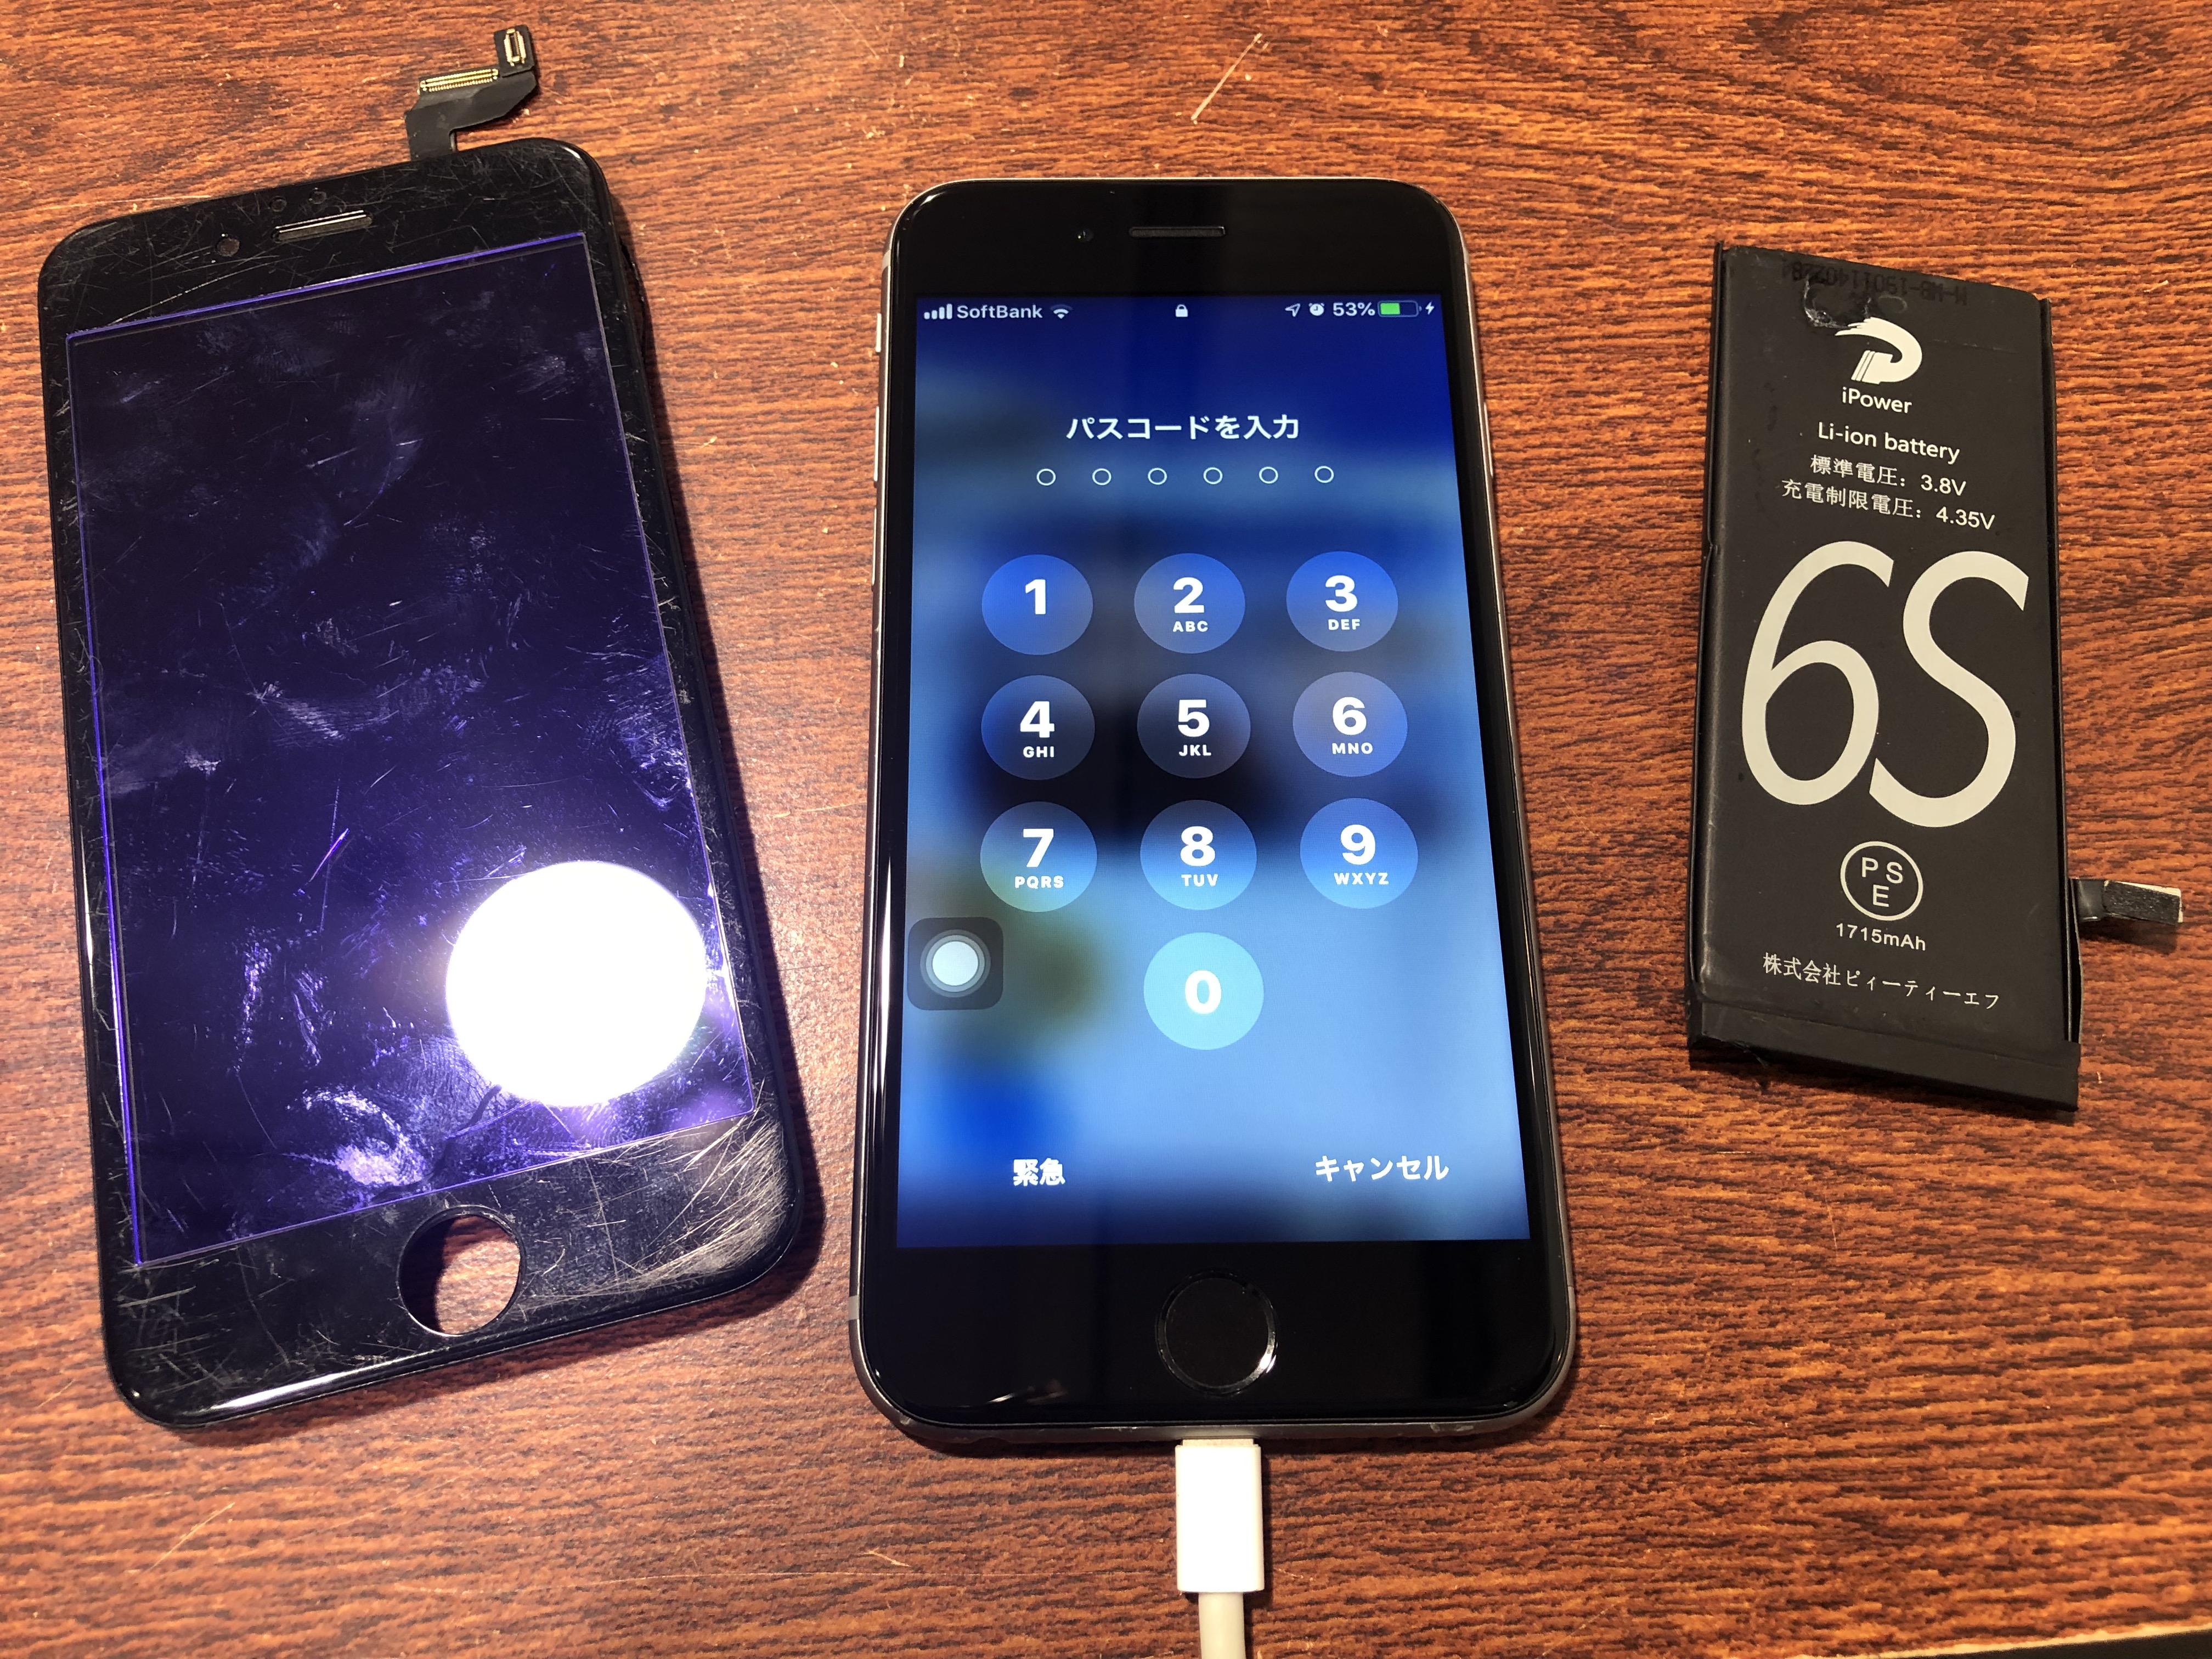 《iPhone6s|バッテリー・画面交換》同時修理でも最短30分~可能♪JR伊丹駅直結!!スマートクールイオンモール伊丹店☆毎日22時まで営業中℡072-767-1011